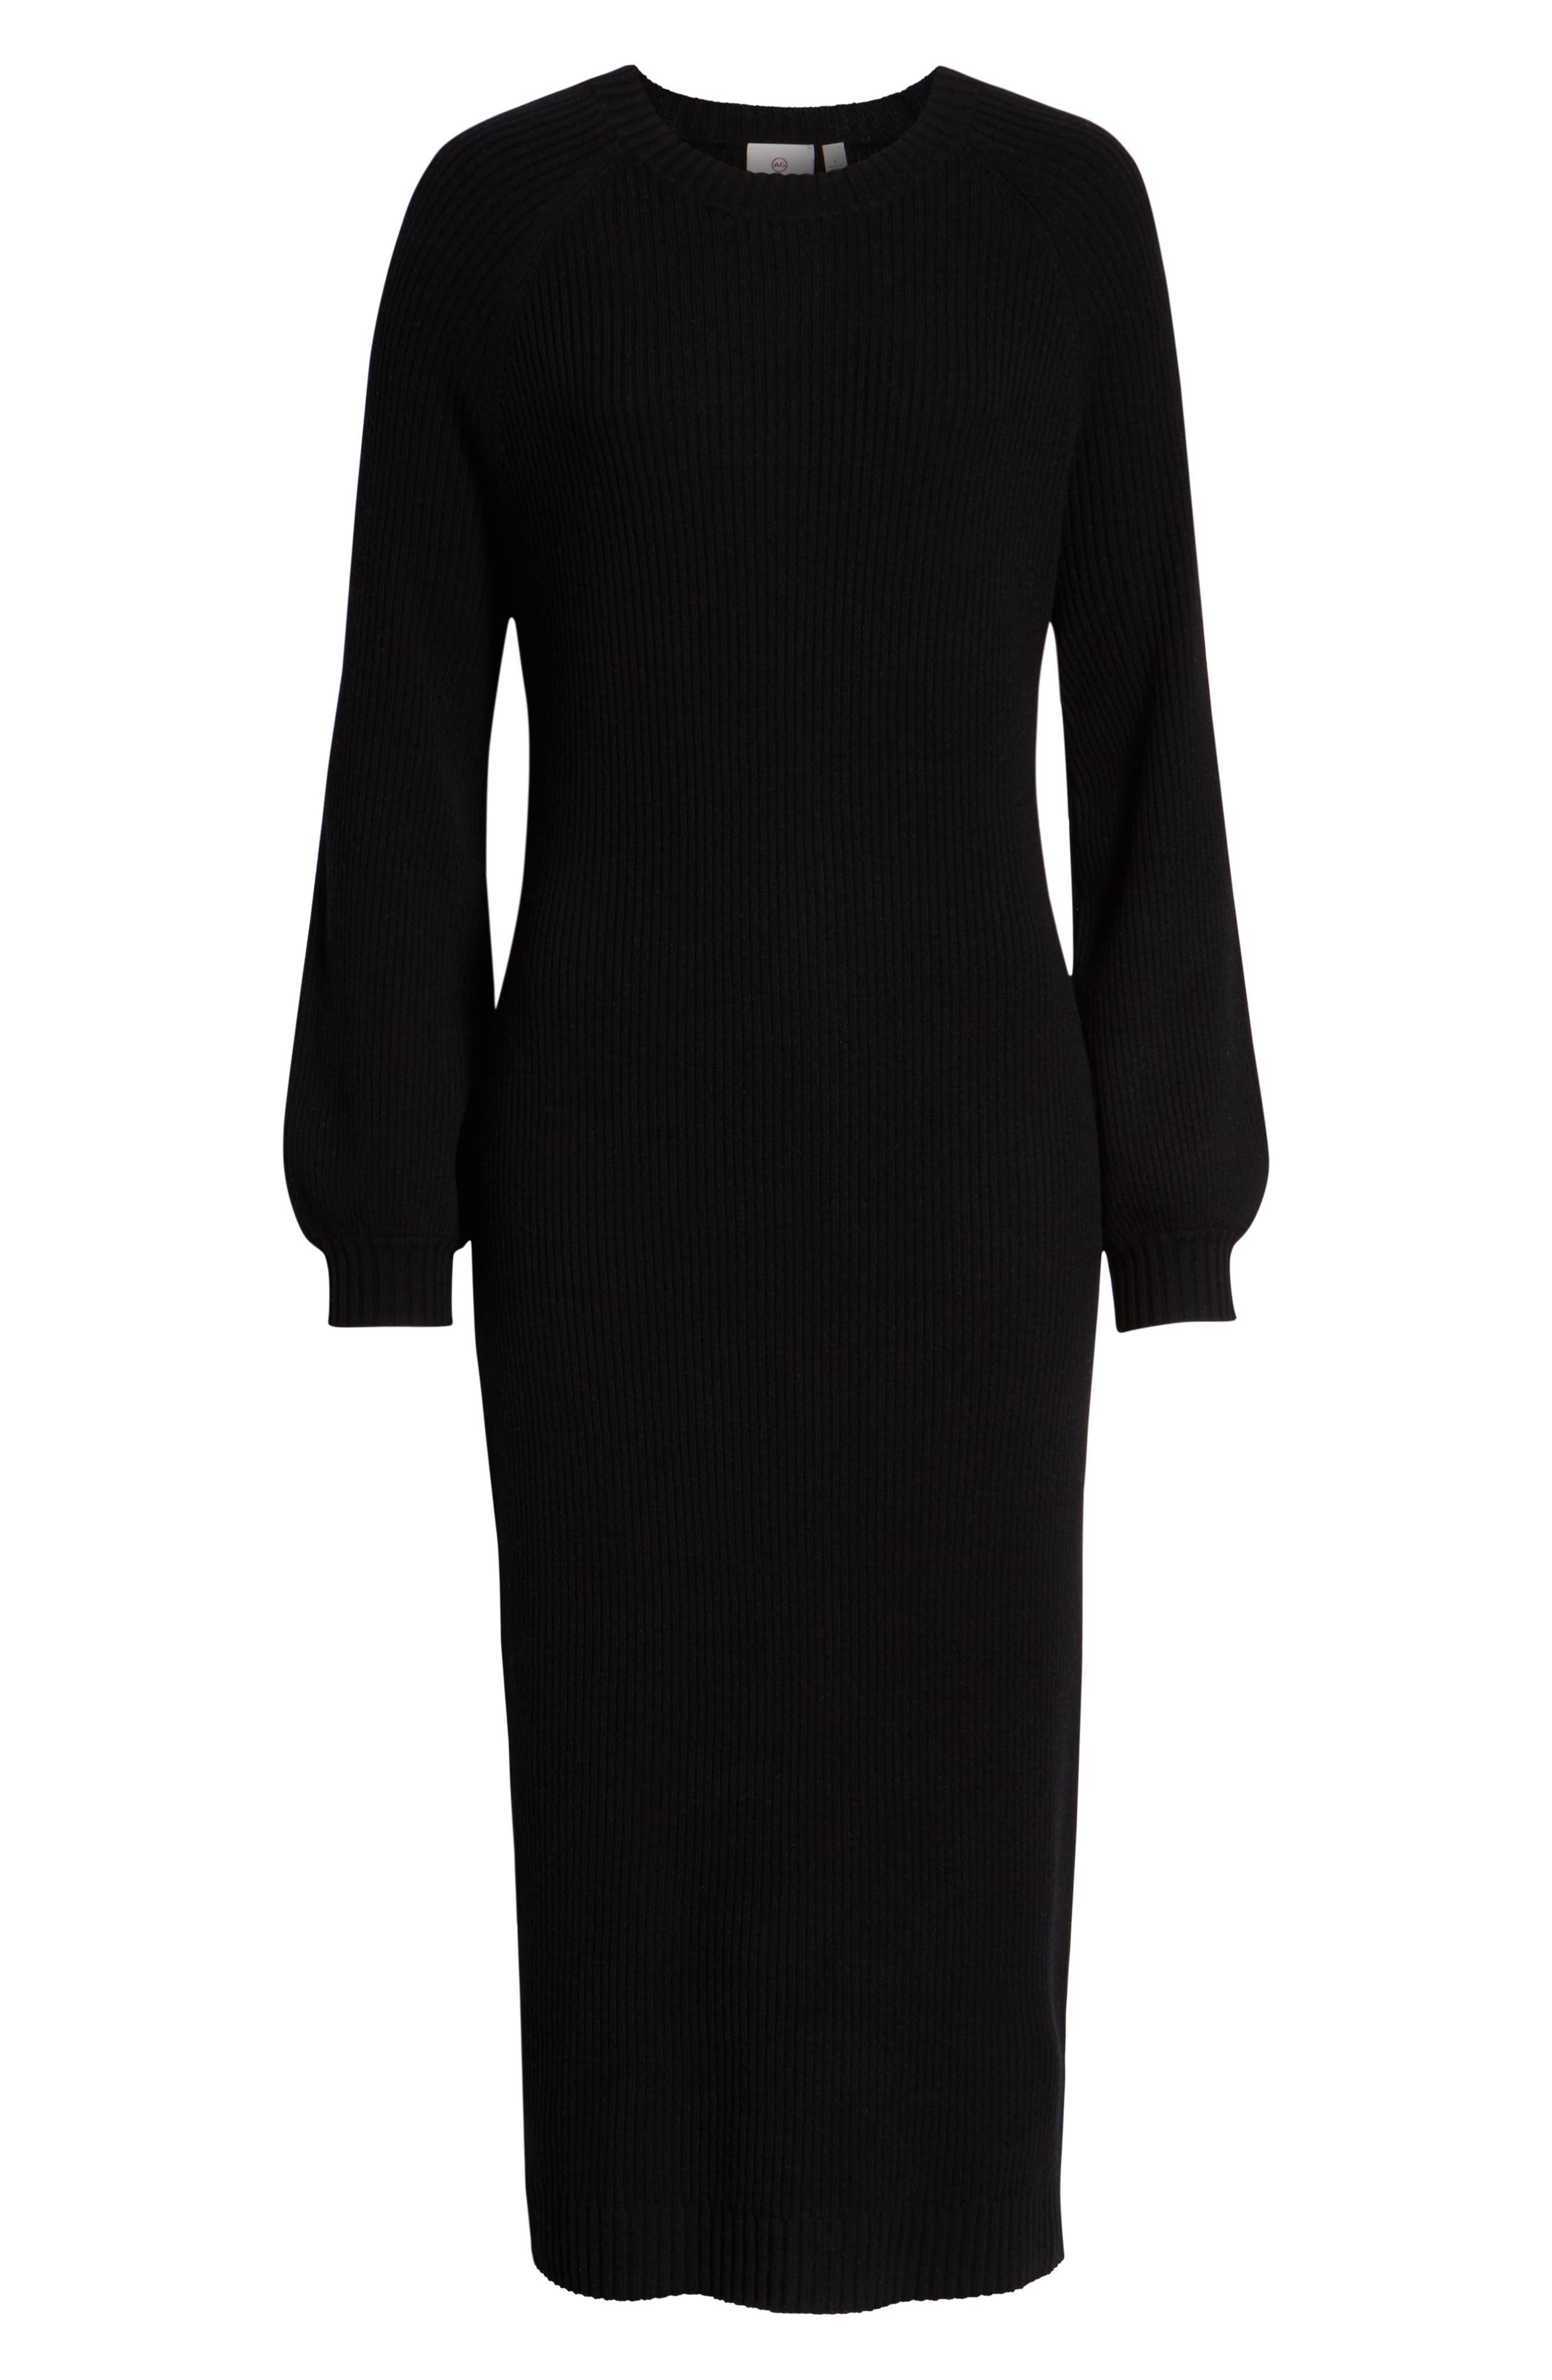 Quaid Knit Sweater Dress,                             Alternate thumbnail 7, color,                             TRUE BLACK